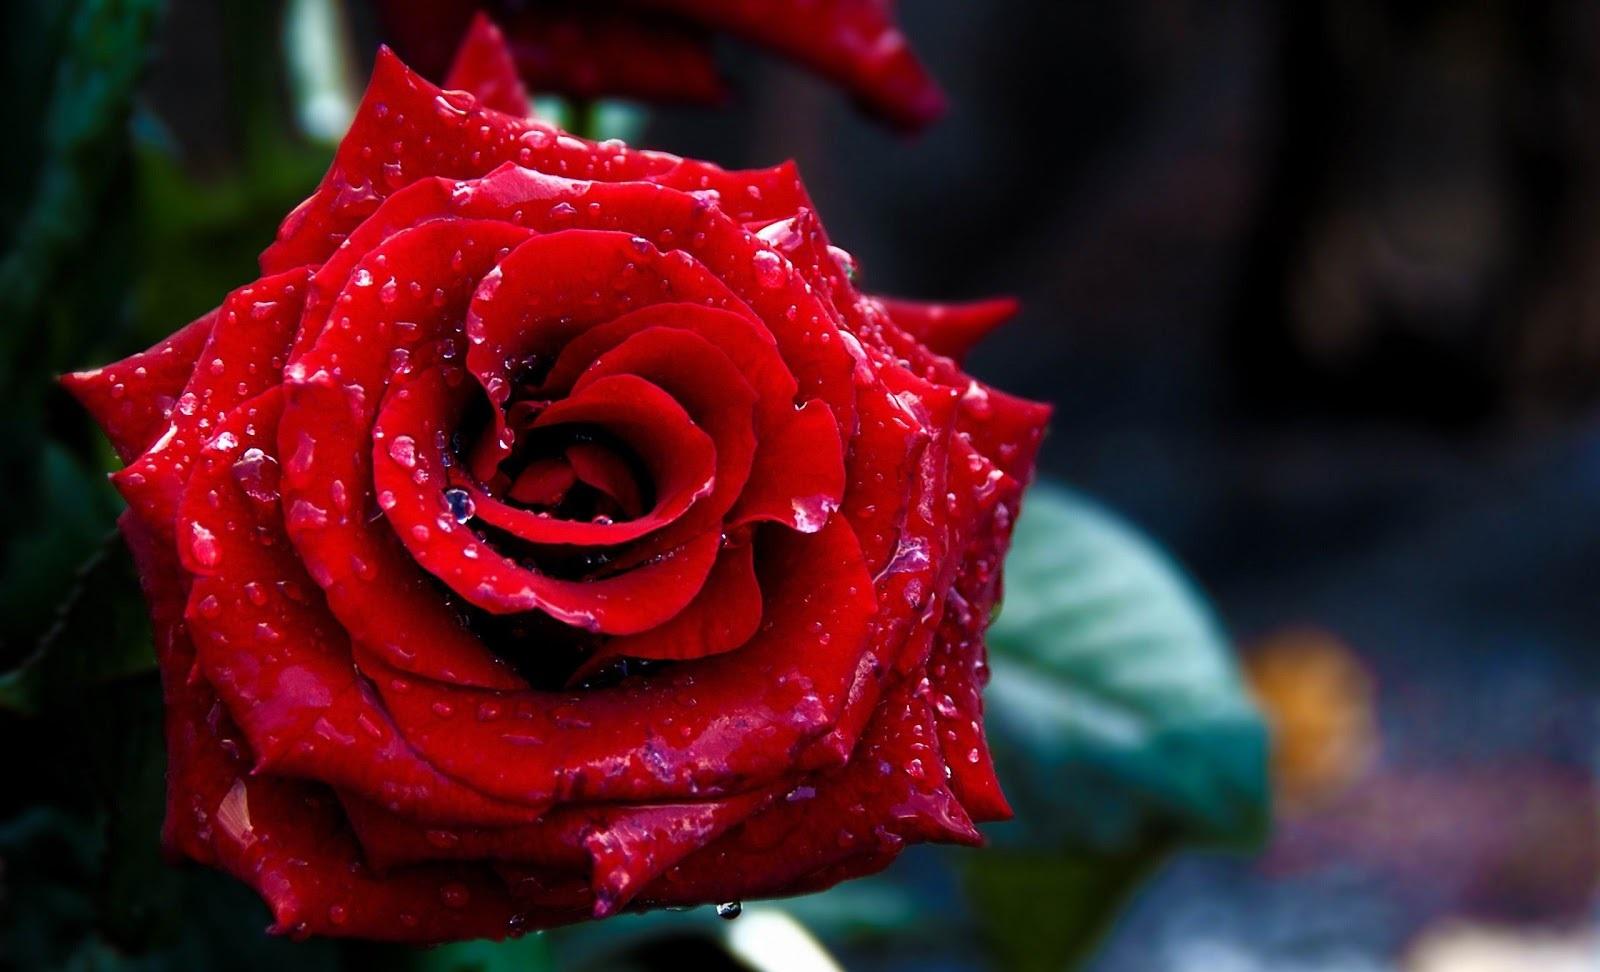 rose day photos hd